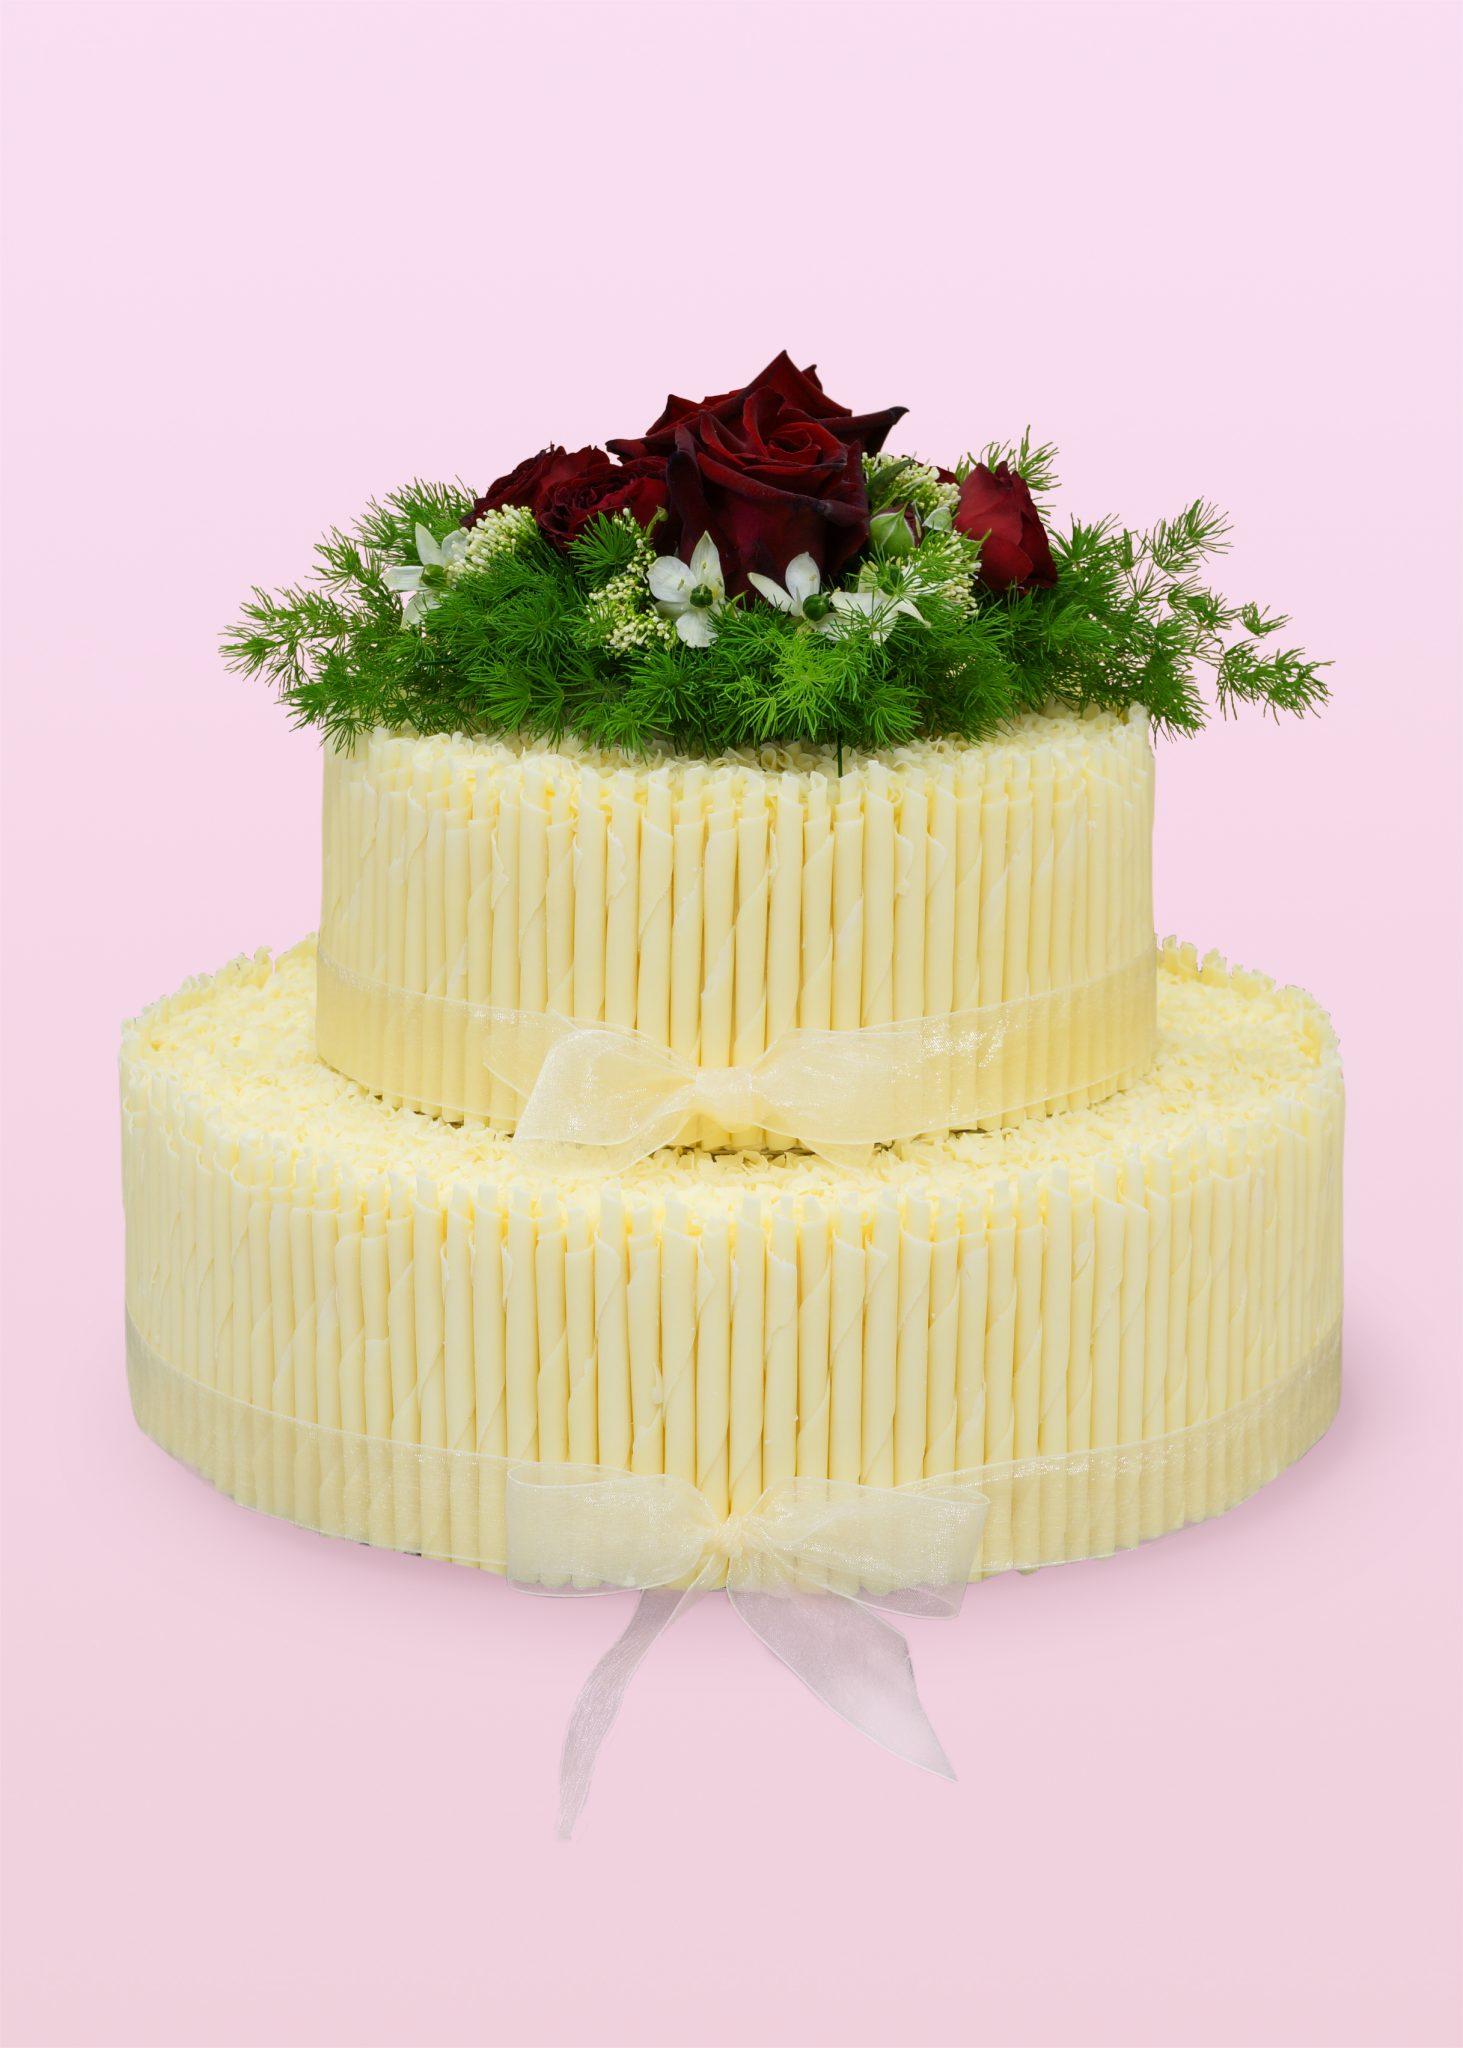 tort weselny, tort na wesele, 2 piętrowy tort